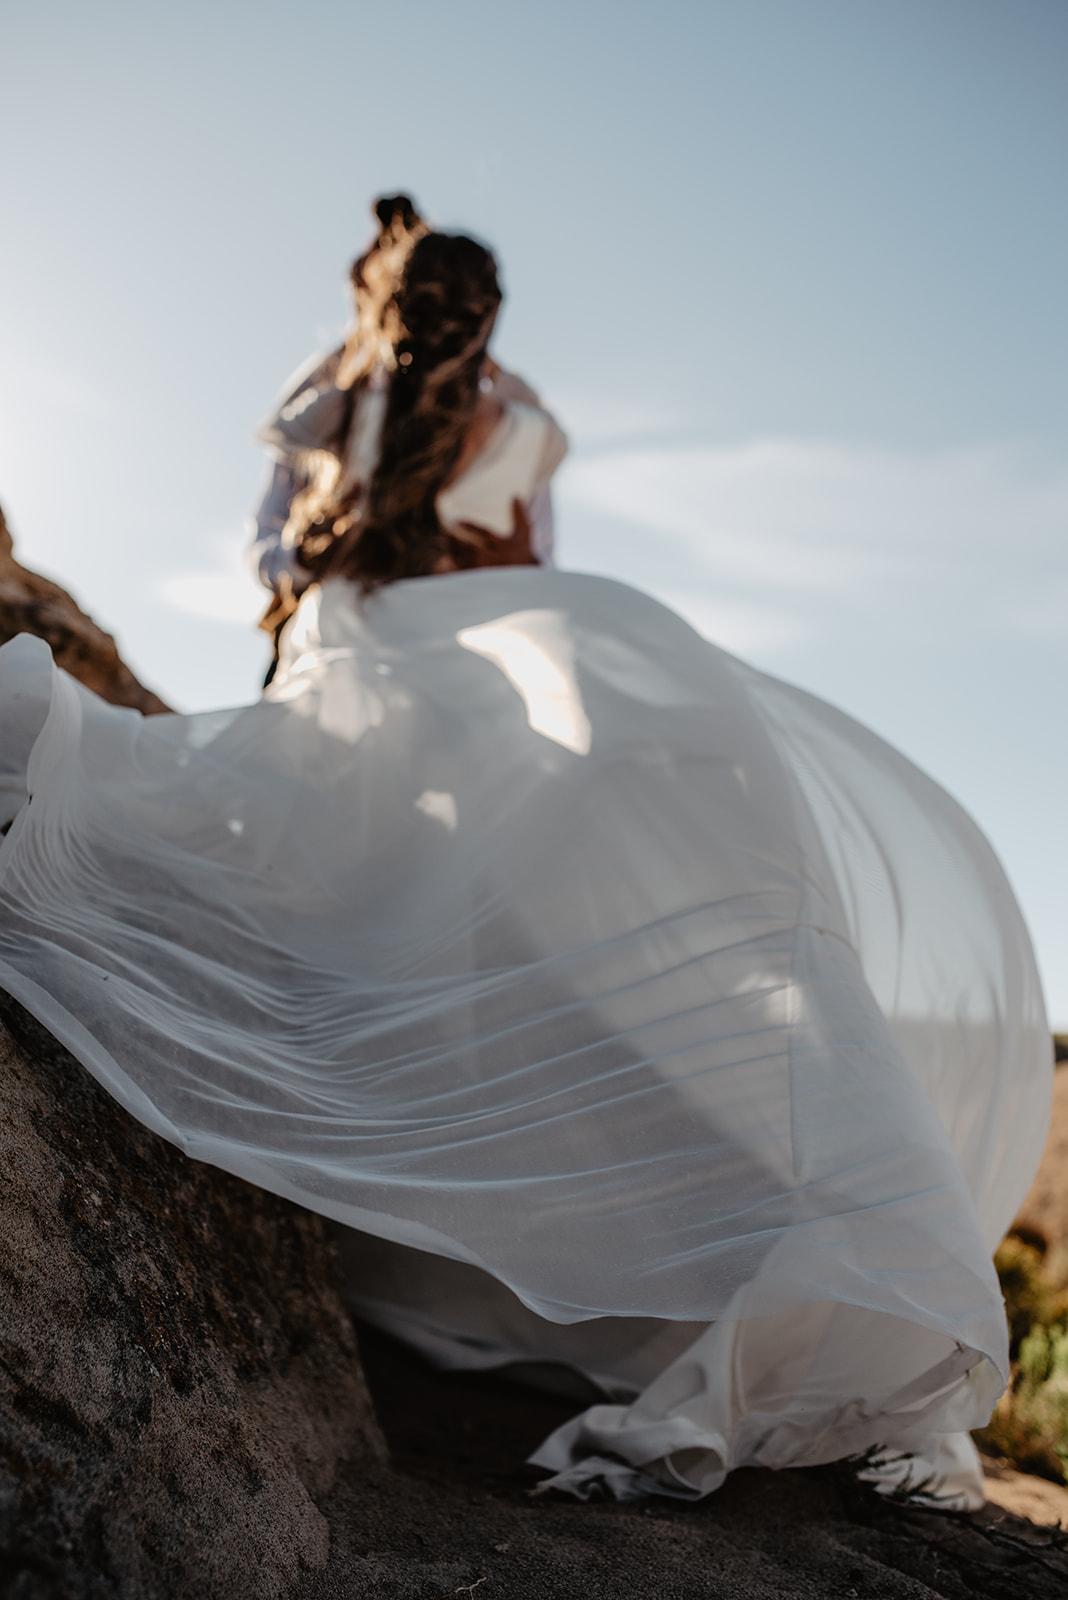 Leanne Marshall Spring 2020 Cleo Dress